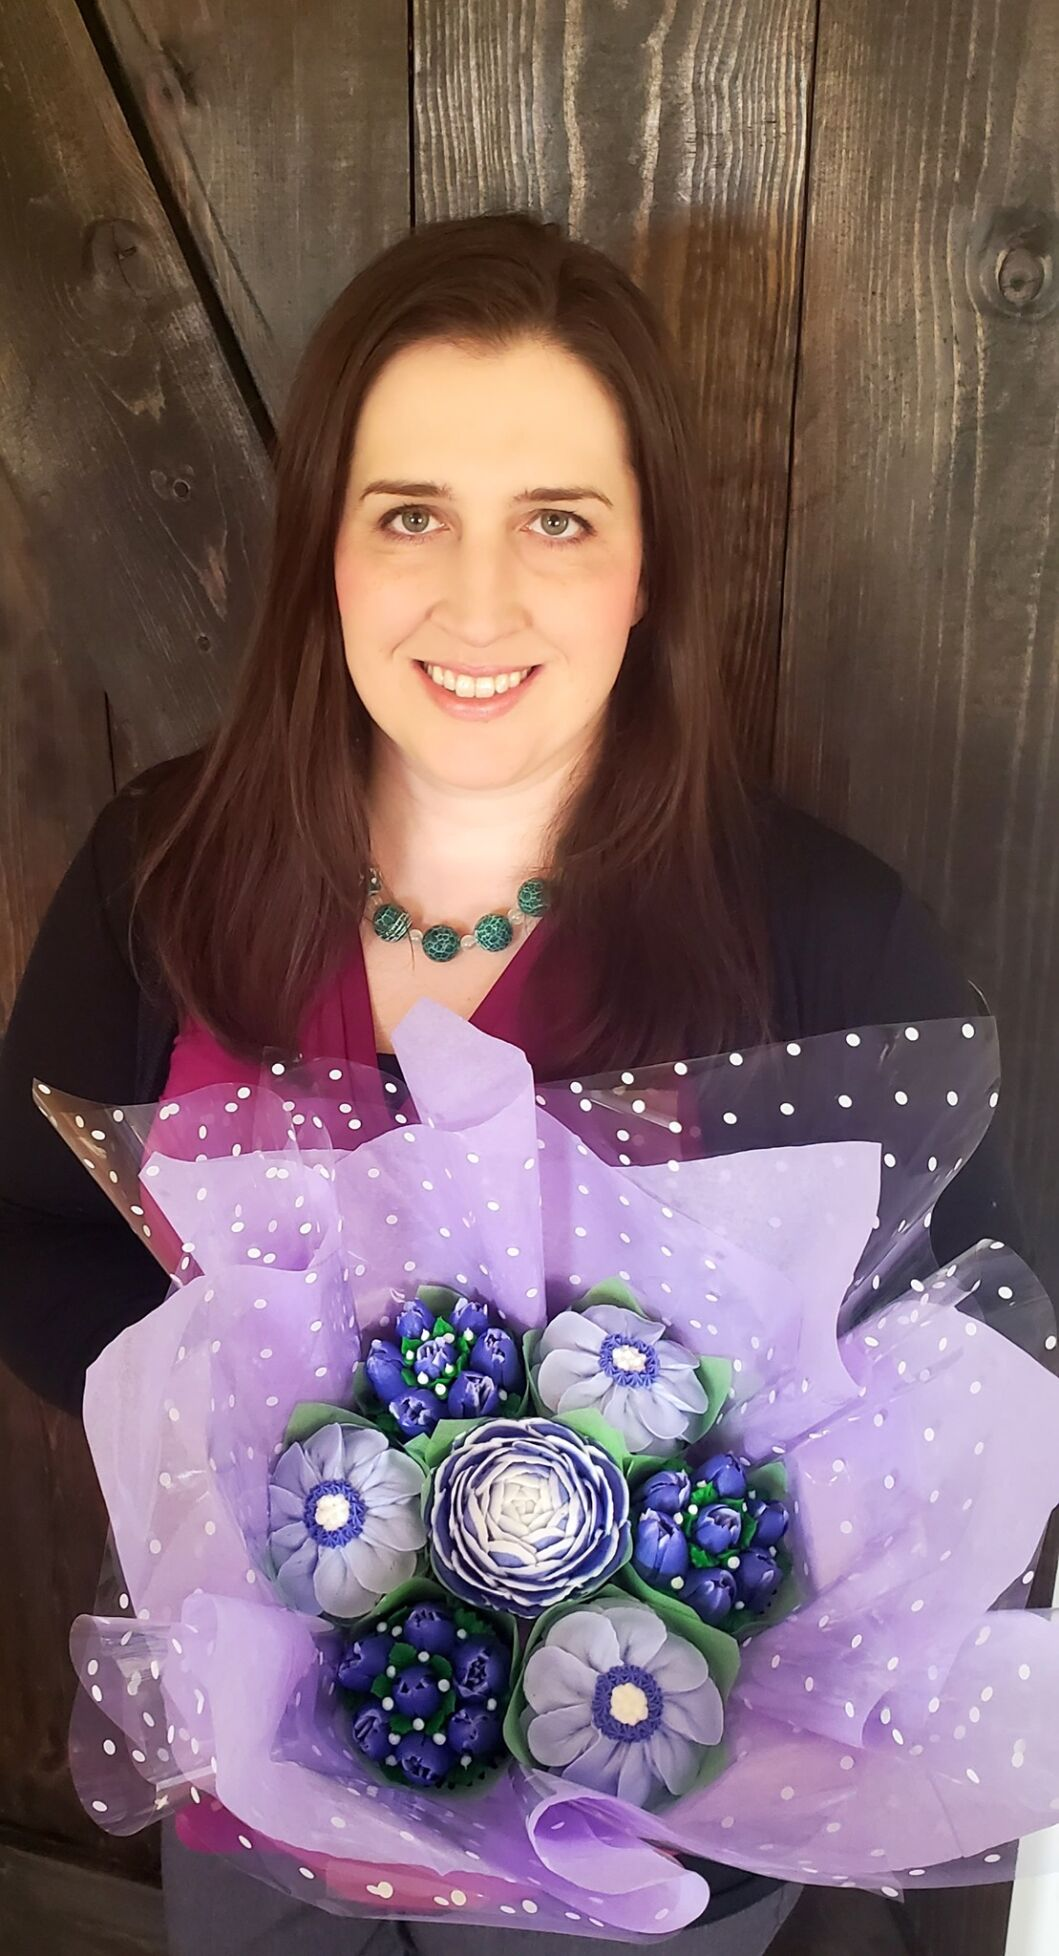 Lovettsville baker's cupcake business blooming